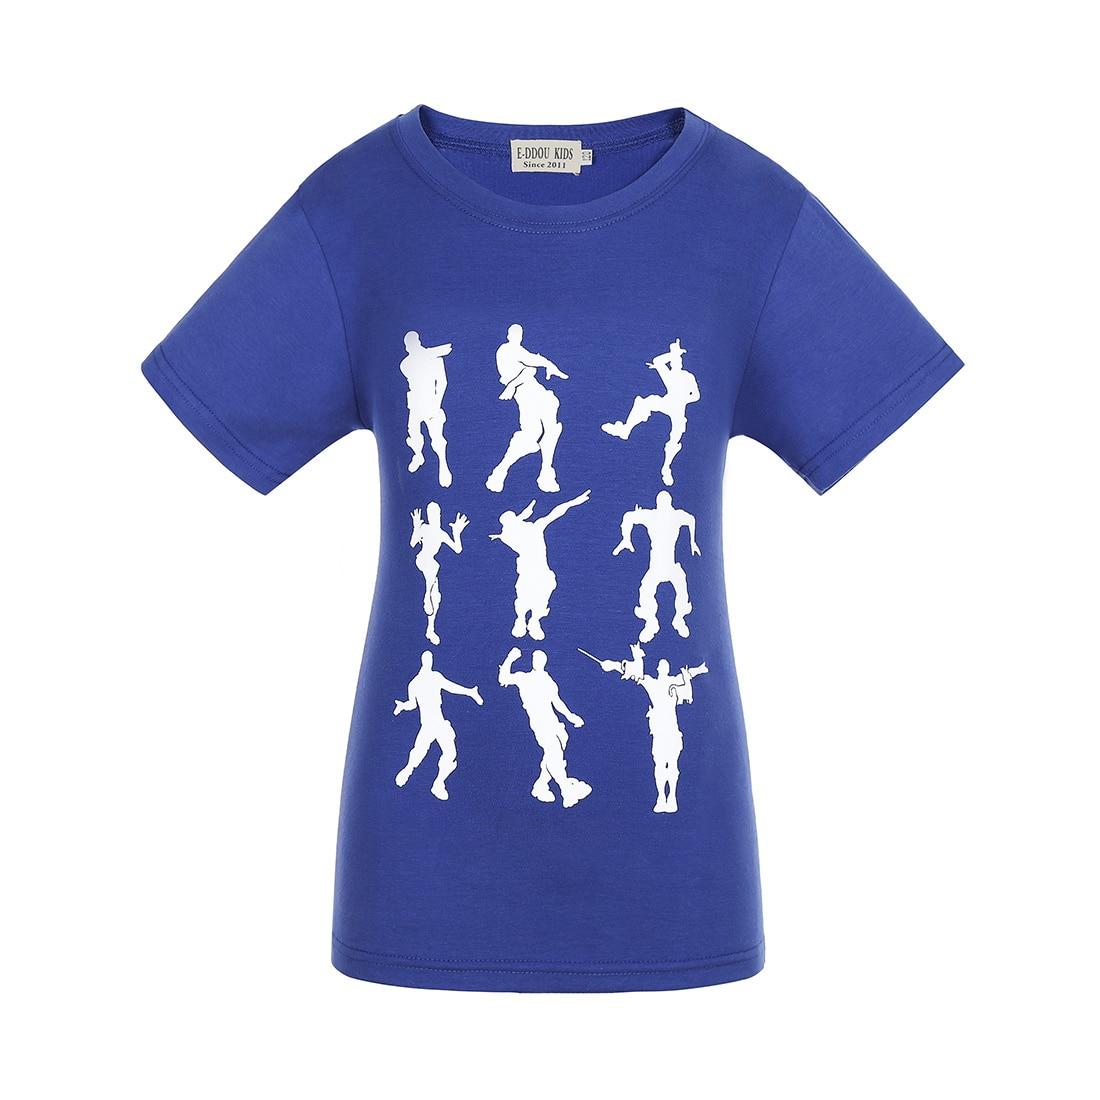 Boys Clothes Celebrations Teenage Children T Shirts Girls Tops Kids Gaming Emote Dances Dab T-Shirts Campus Funny Youth TShirt